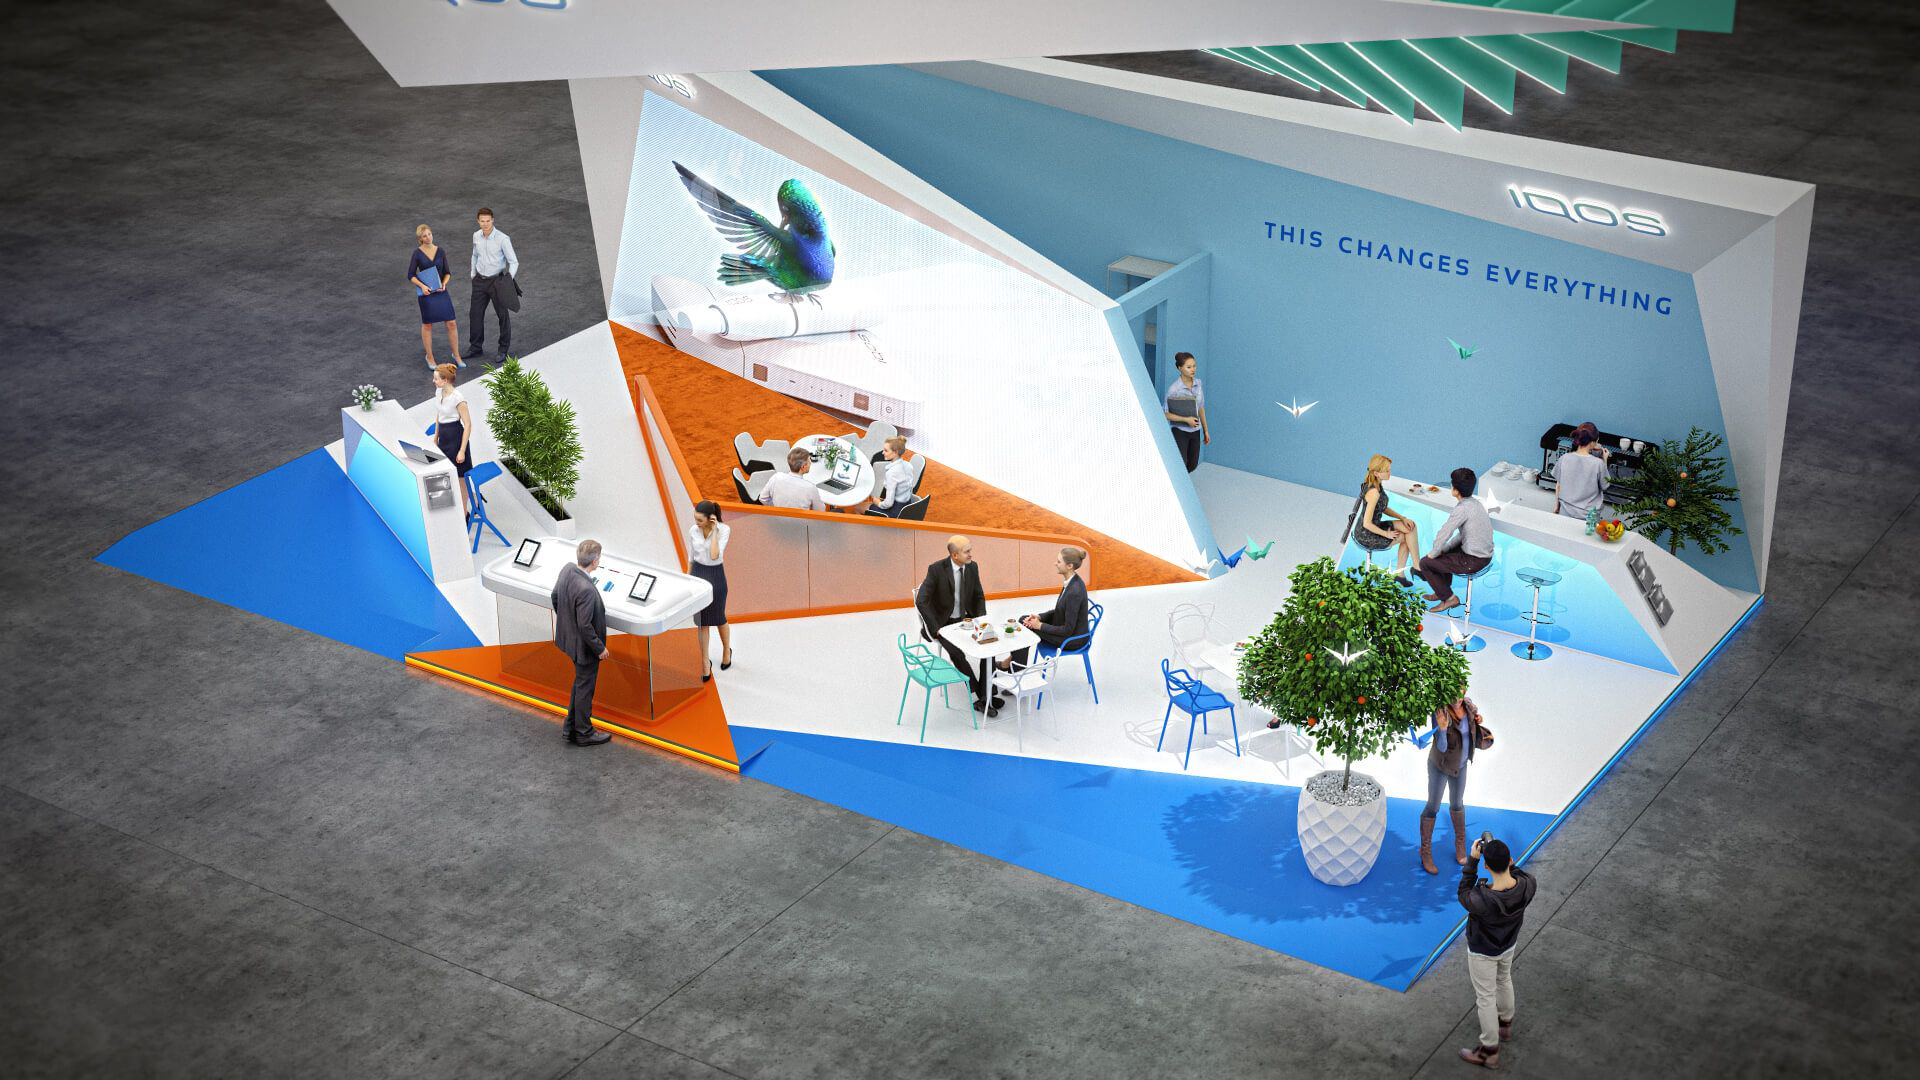 Exhibition Booth Design Concept : Iqos exhibition booth design concept booth design booth design